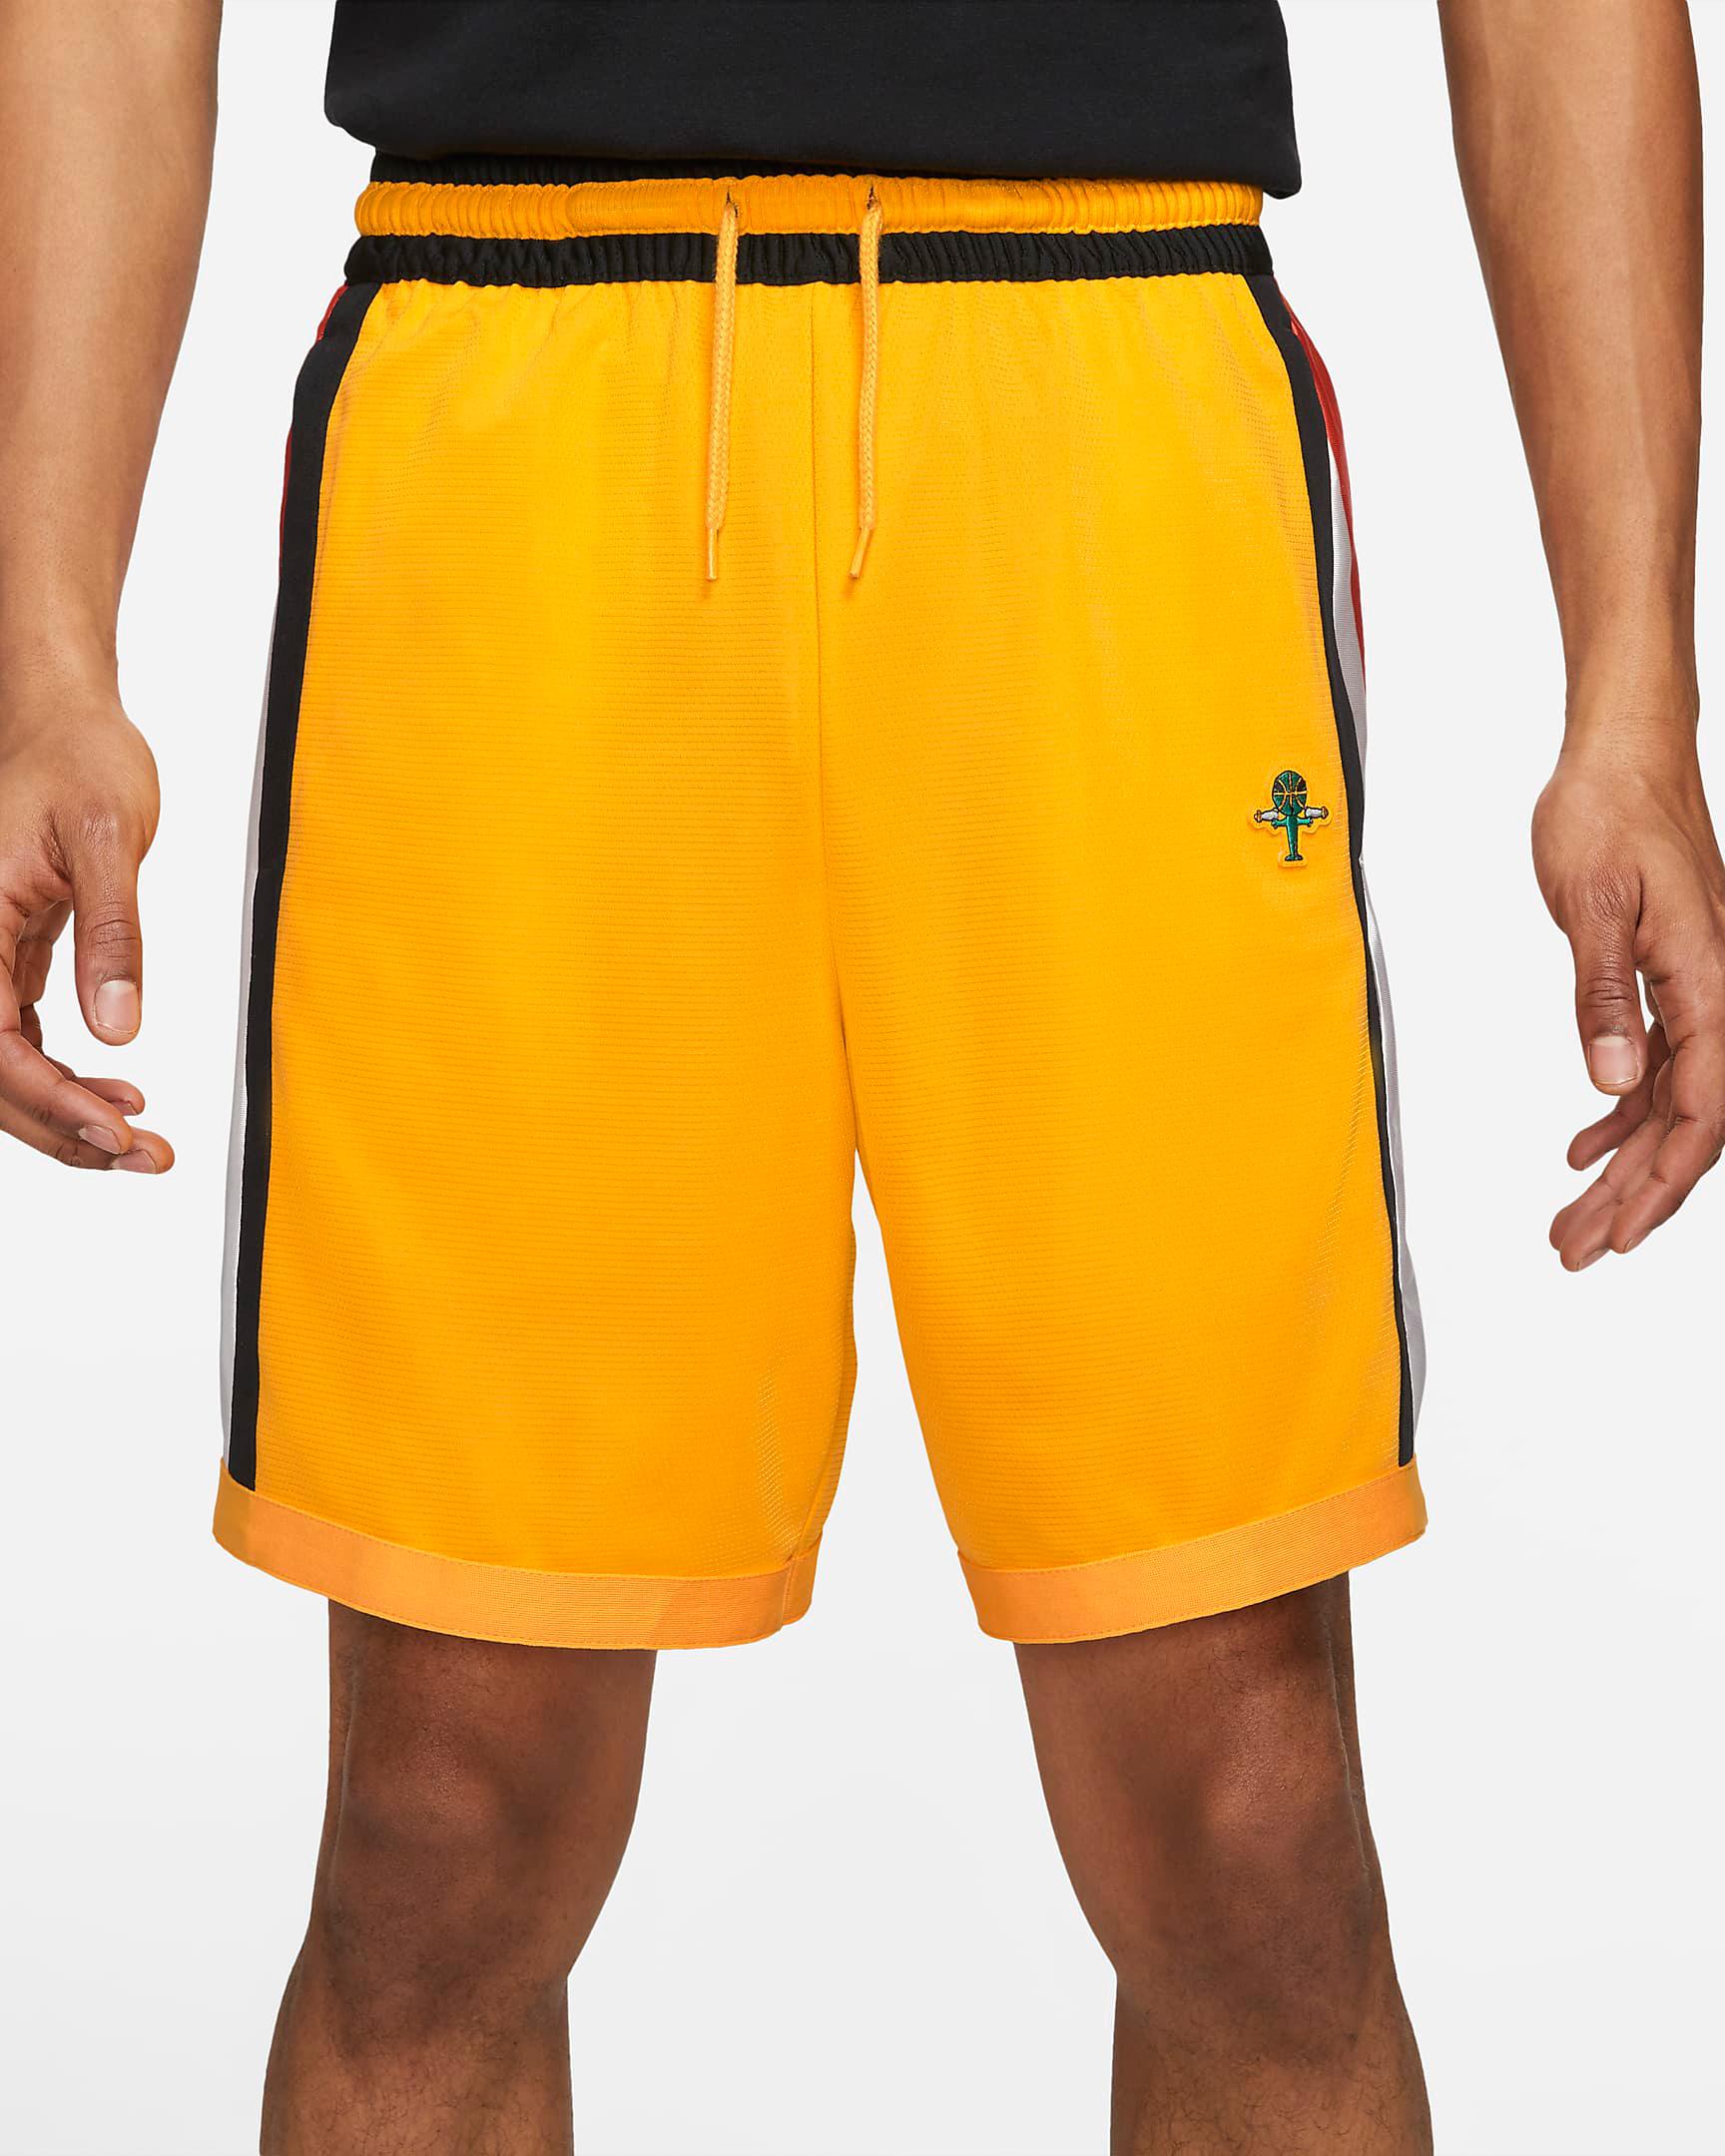 nike-uptempo-rayguns-shorts-gold-yellow-1